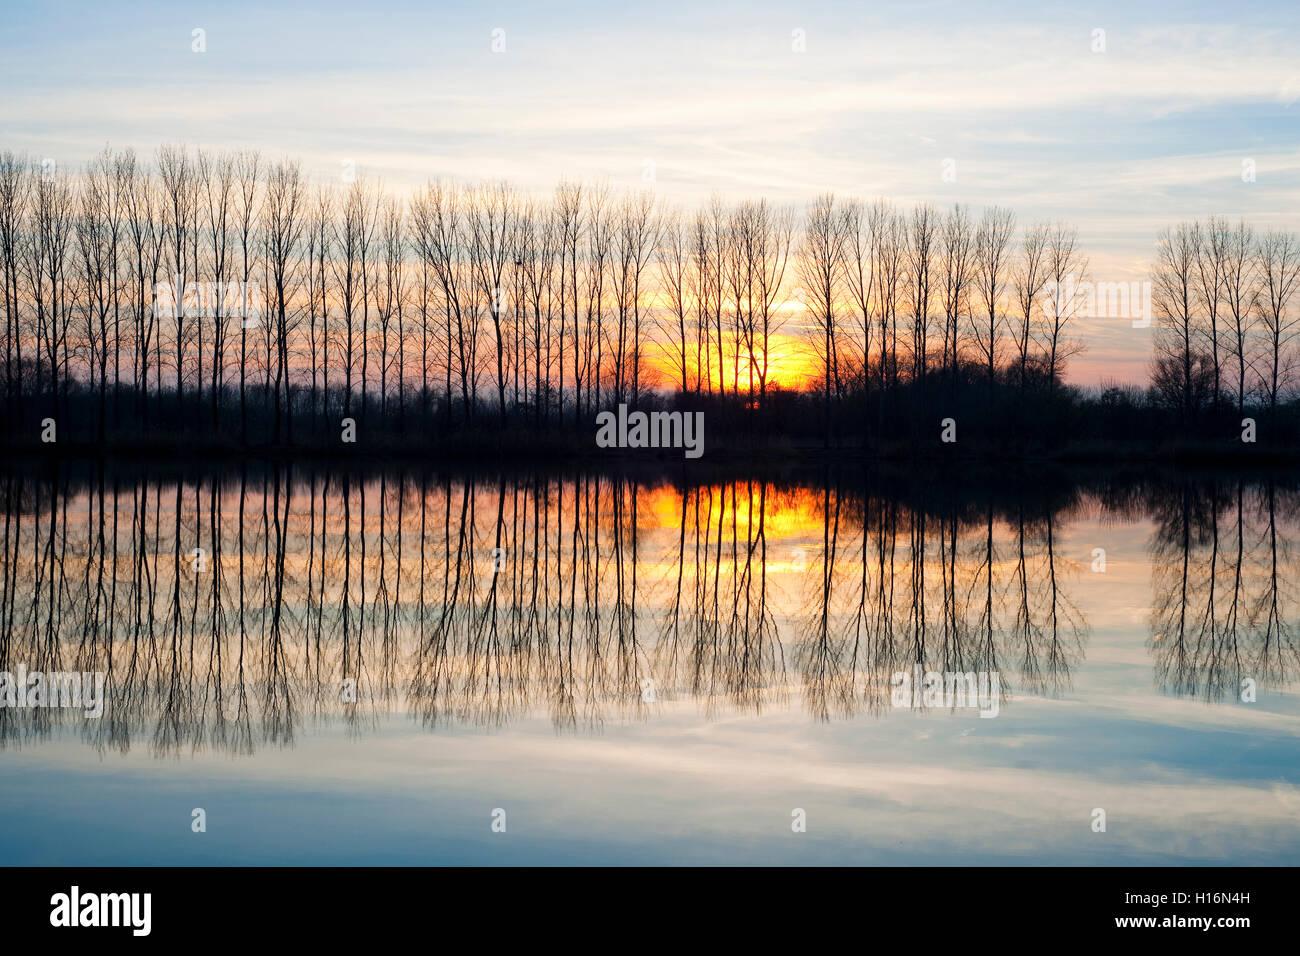 Sunset, Nature Reserve Herbslebener Teiche, Herbsleben ponds, Herbsleben, Thuringia, Germany - Stock Image